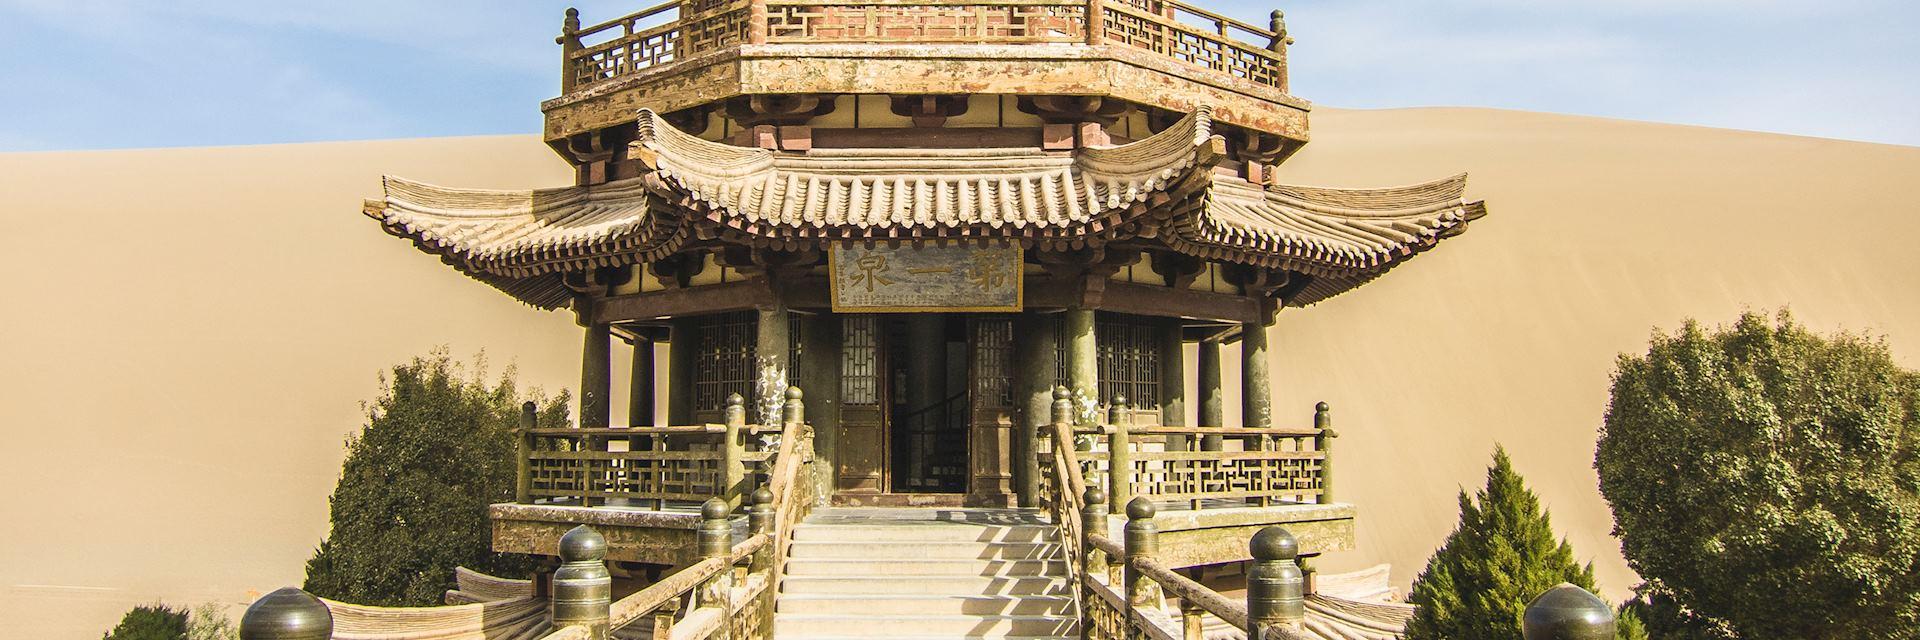 Mingyue Pavilion, Dunhuang